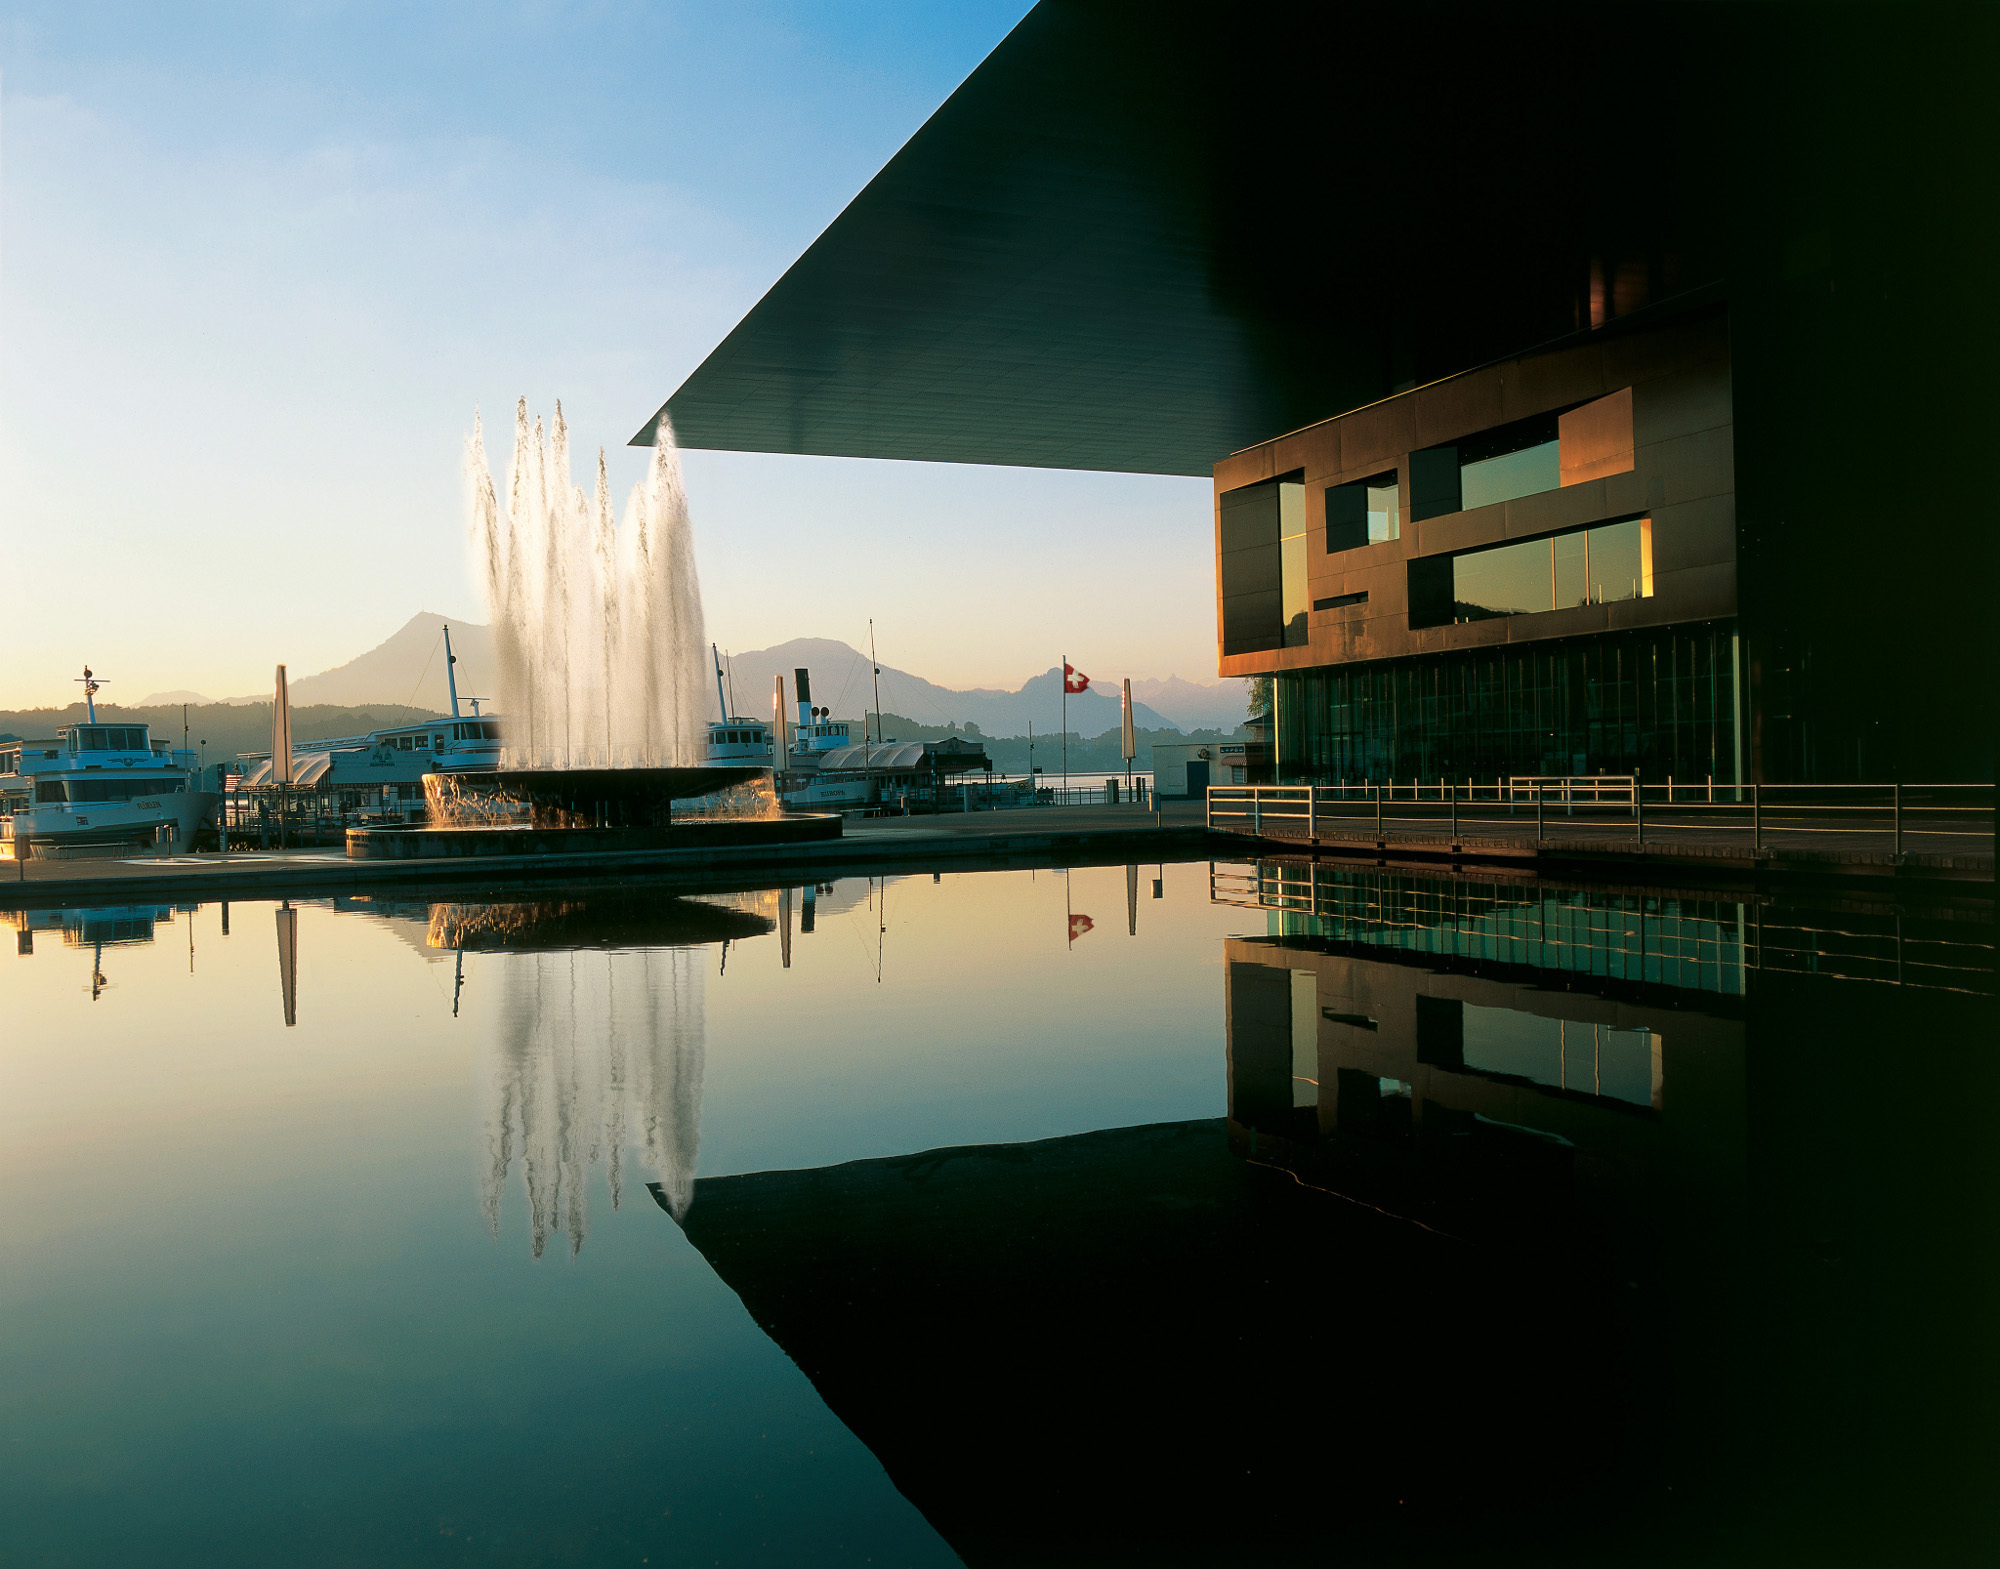 KKL Luzern, Lucerne music venue, Time Out Switzerland